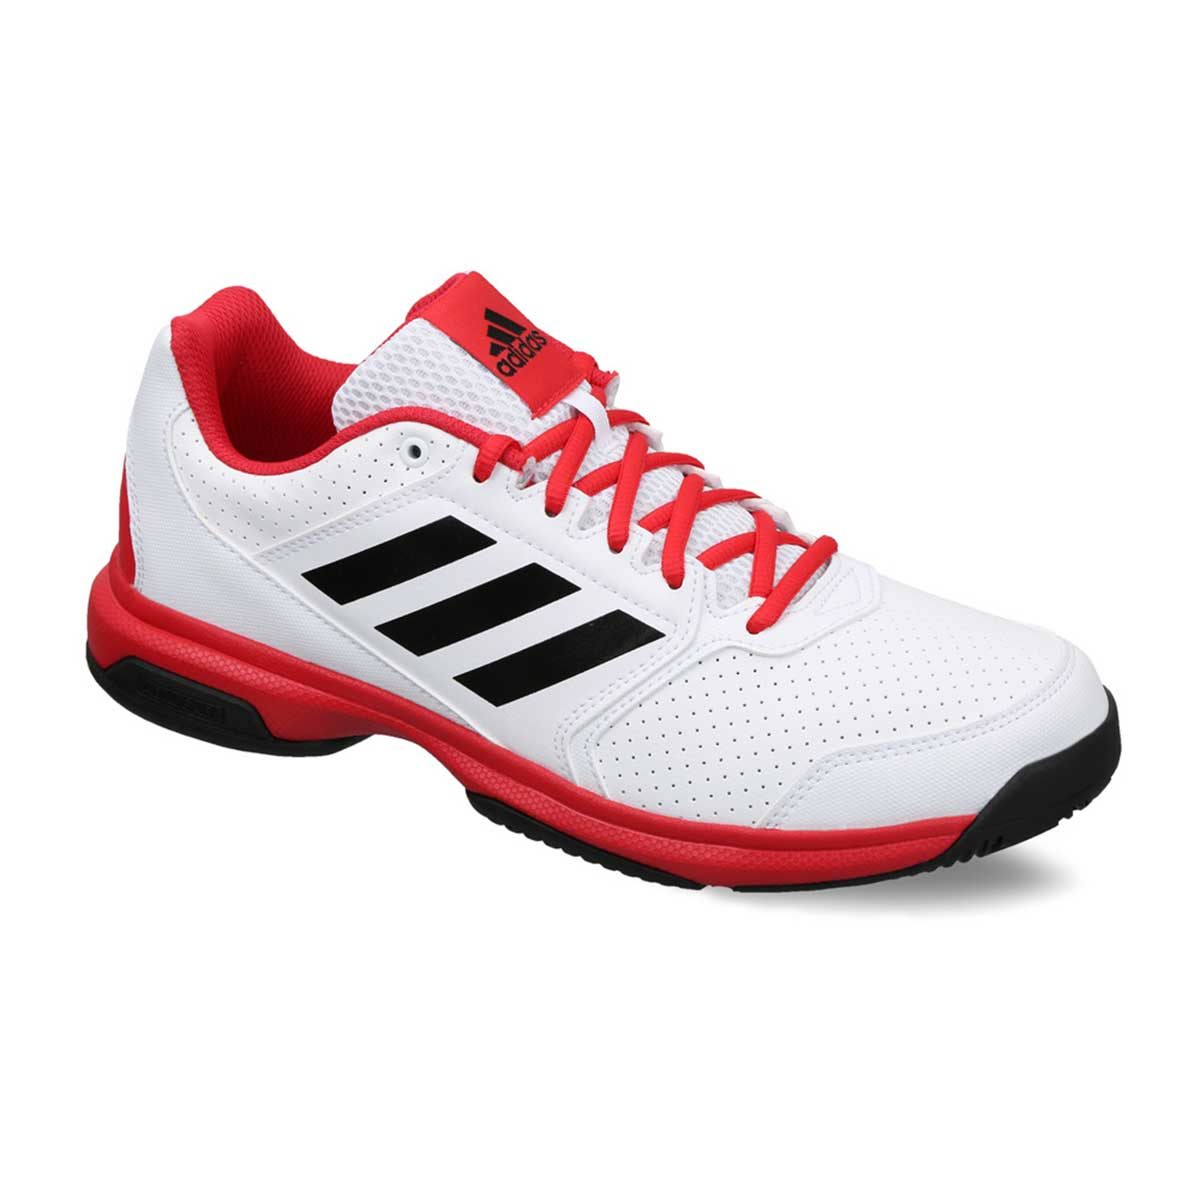 best service ca5ba d6751 Adidas Adizero Attack Low Tennis Shoes